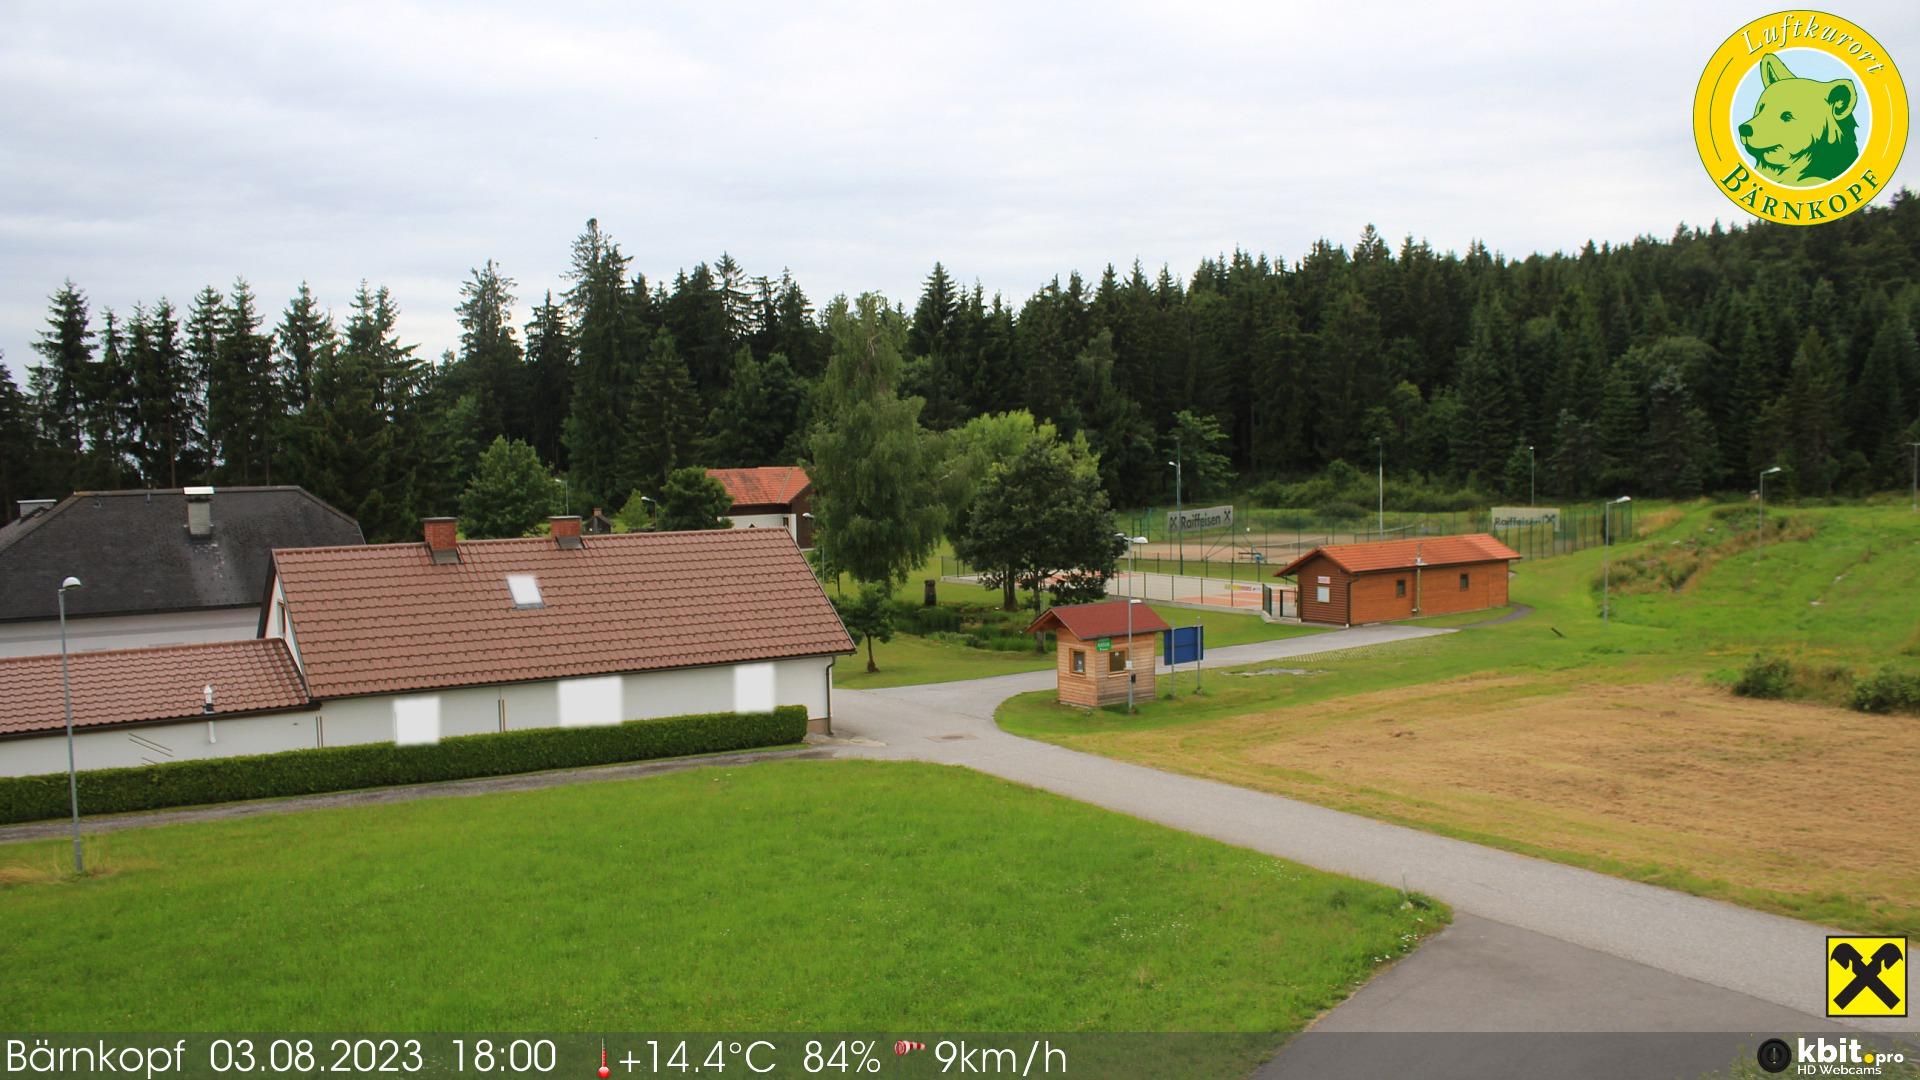 Aktuelle Livebilder aus dem Luftkurort Bärnkopf